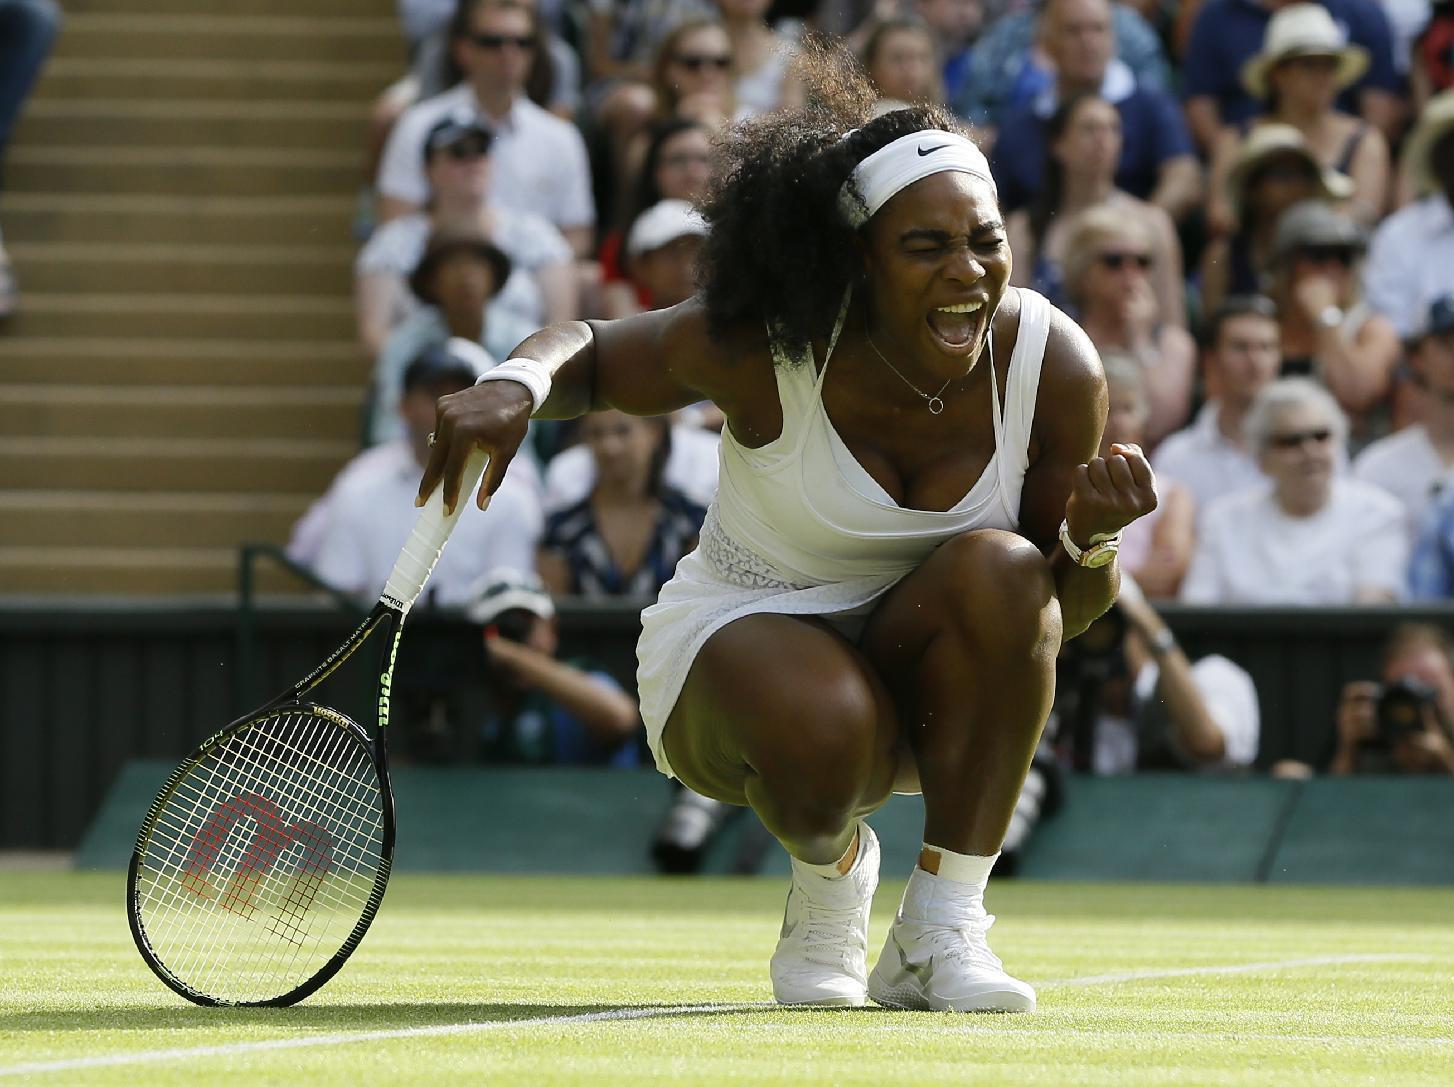 Serena Williams celebrates winning a point against Heather Watson. (AP)